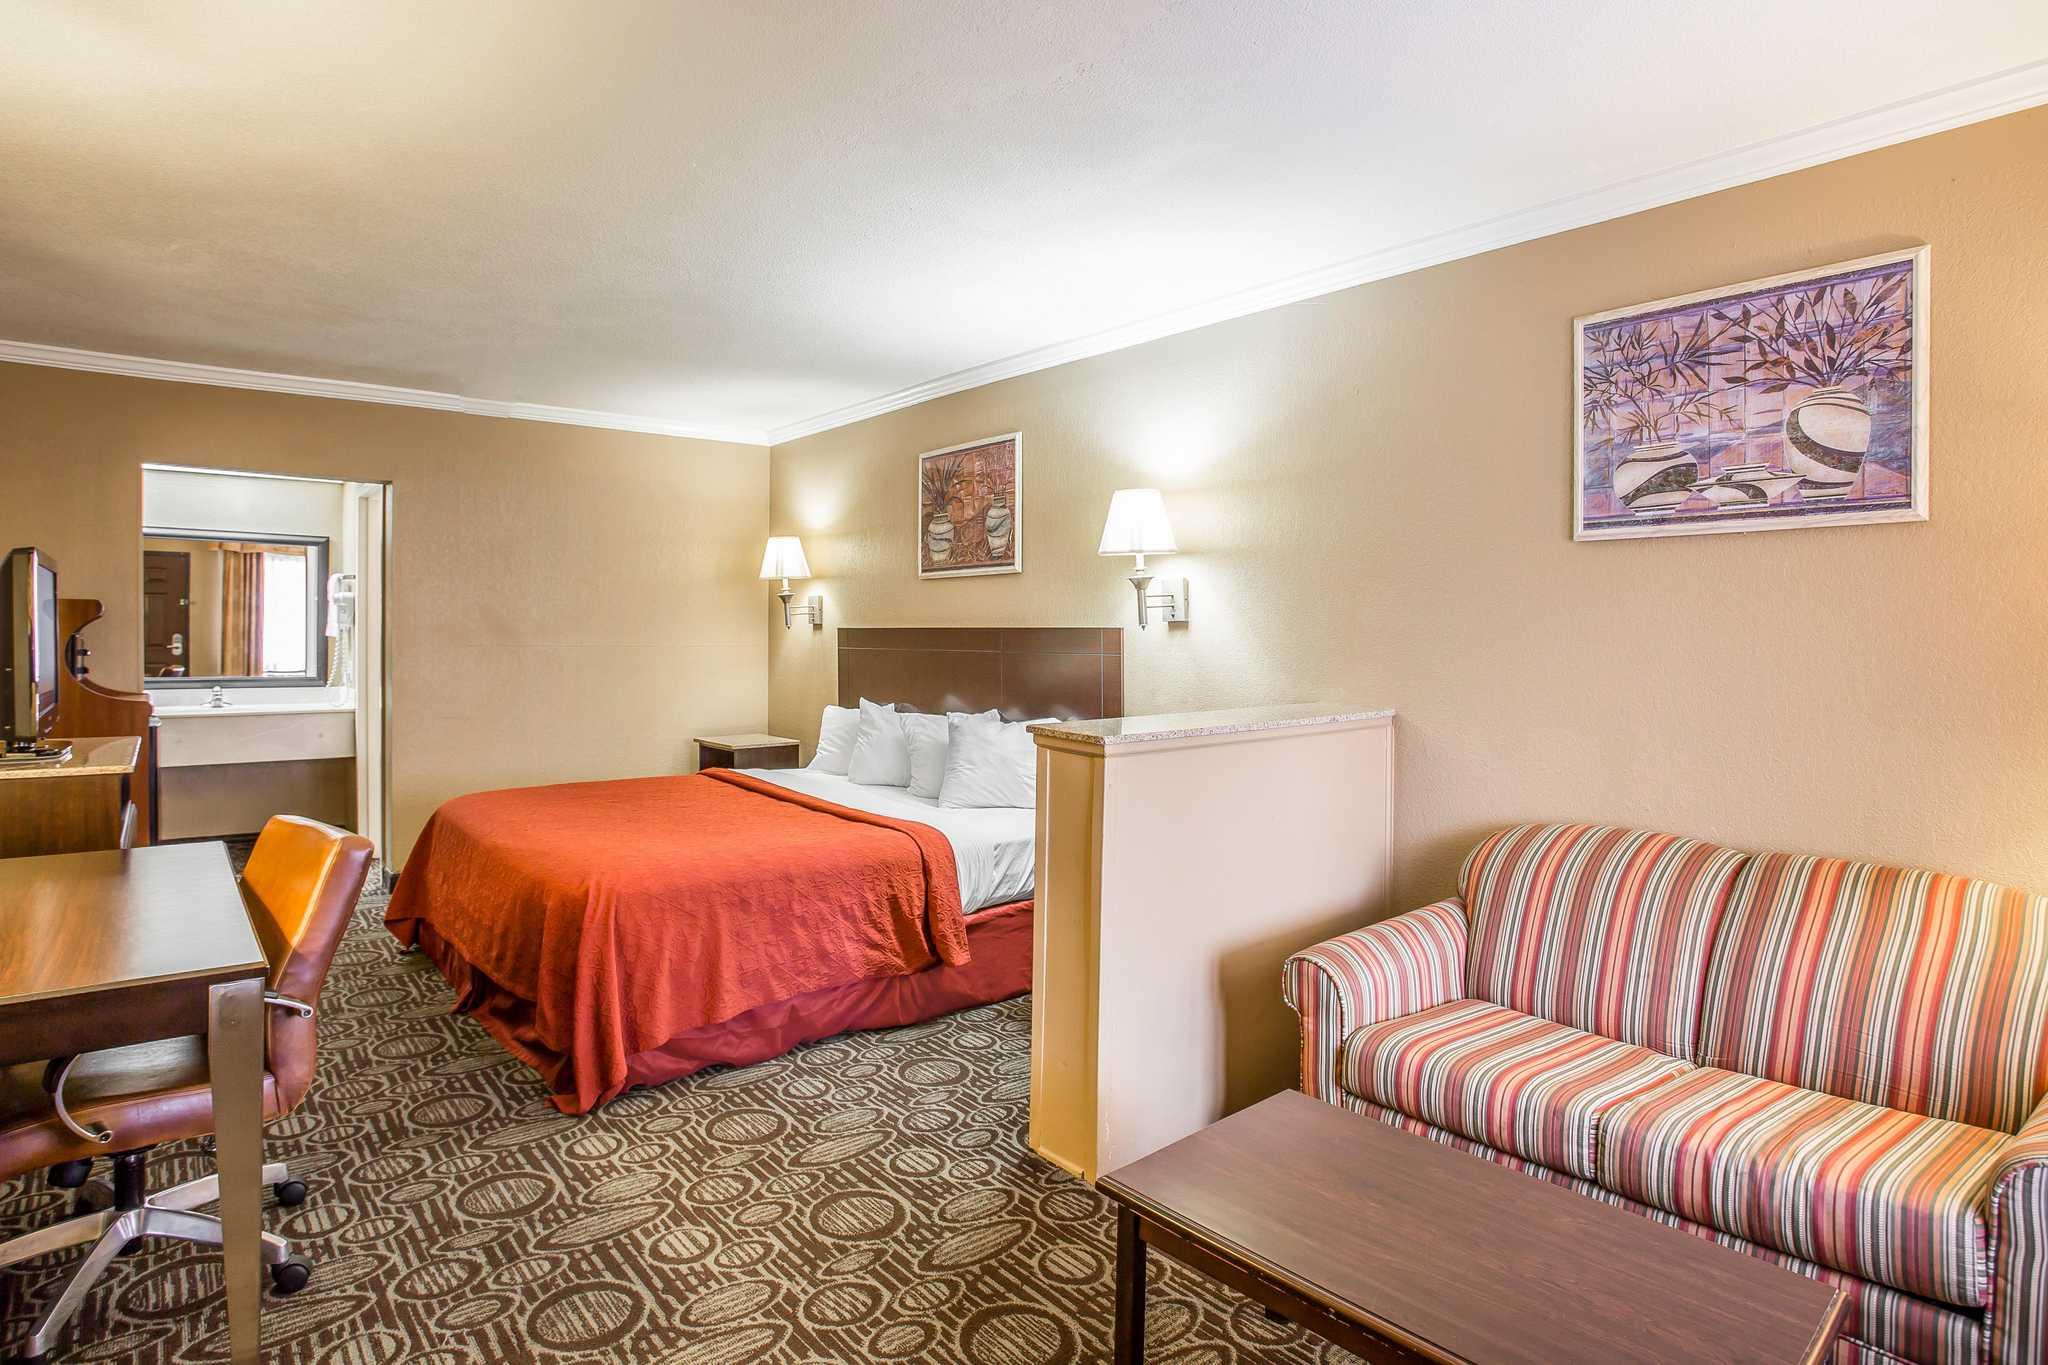 Quality Inn & Suites Ft. Jackson Maingate image 7